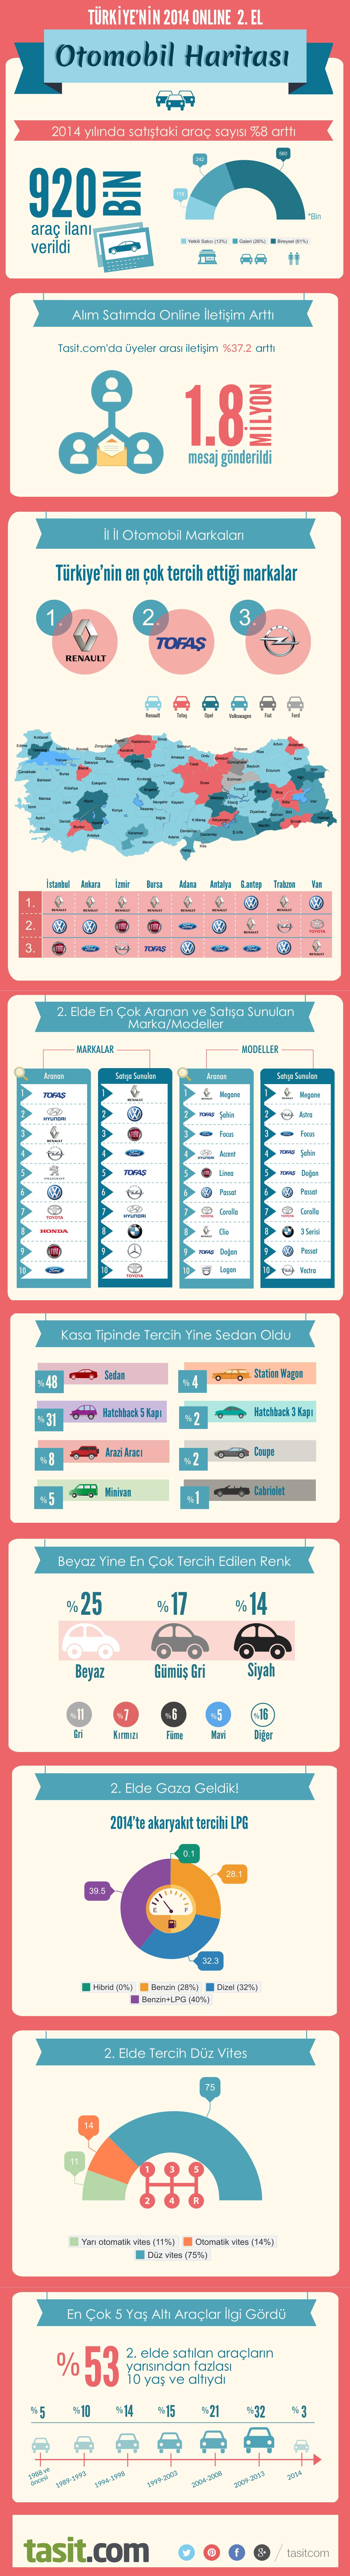 Tasit com 2014 Infografik